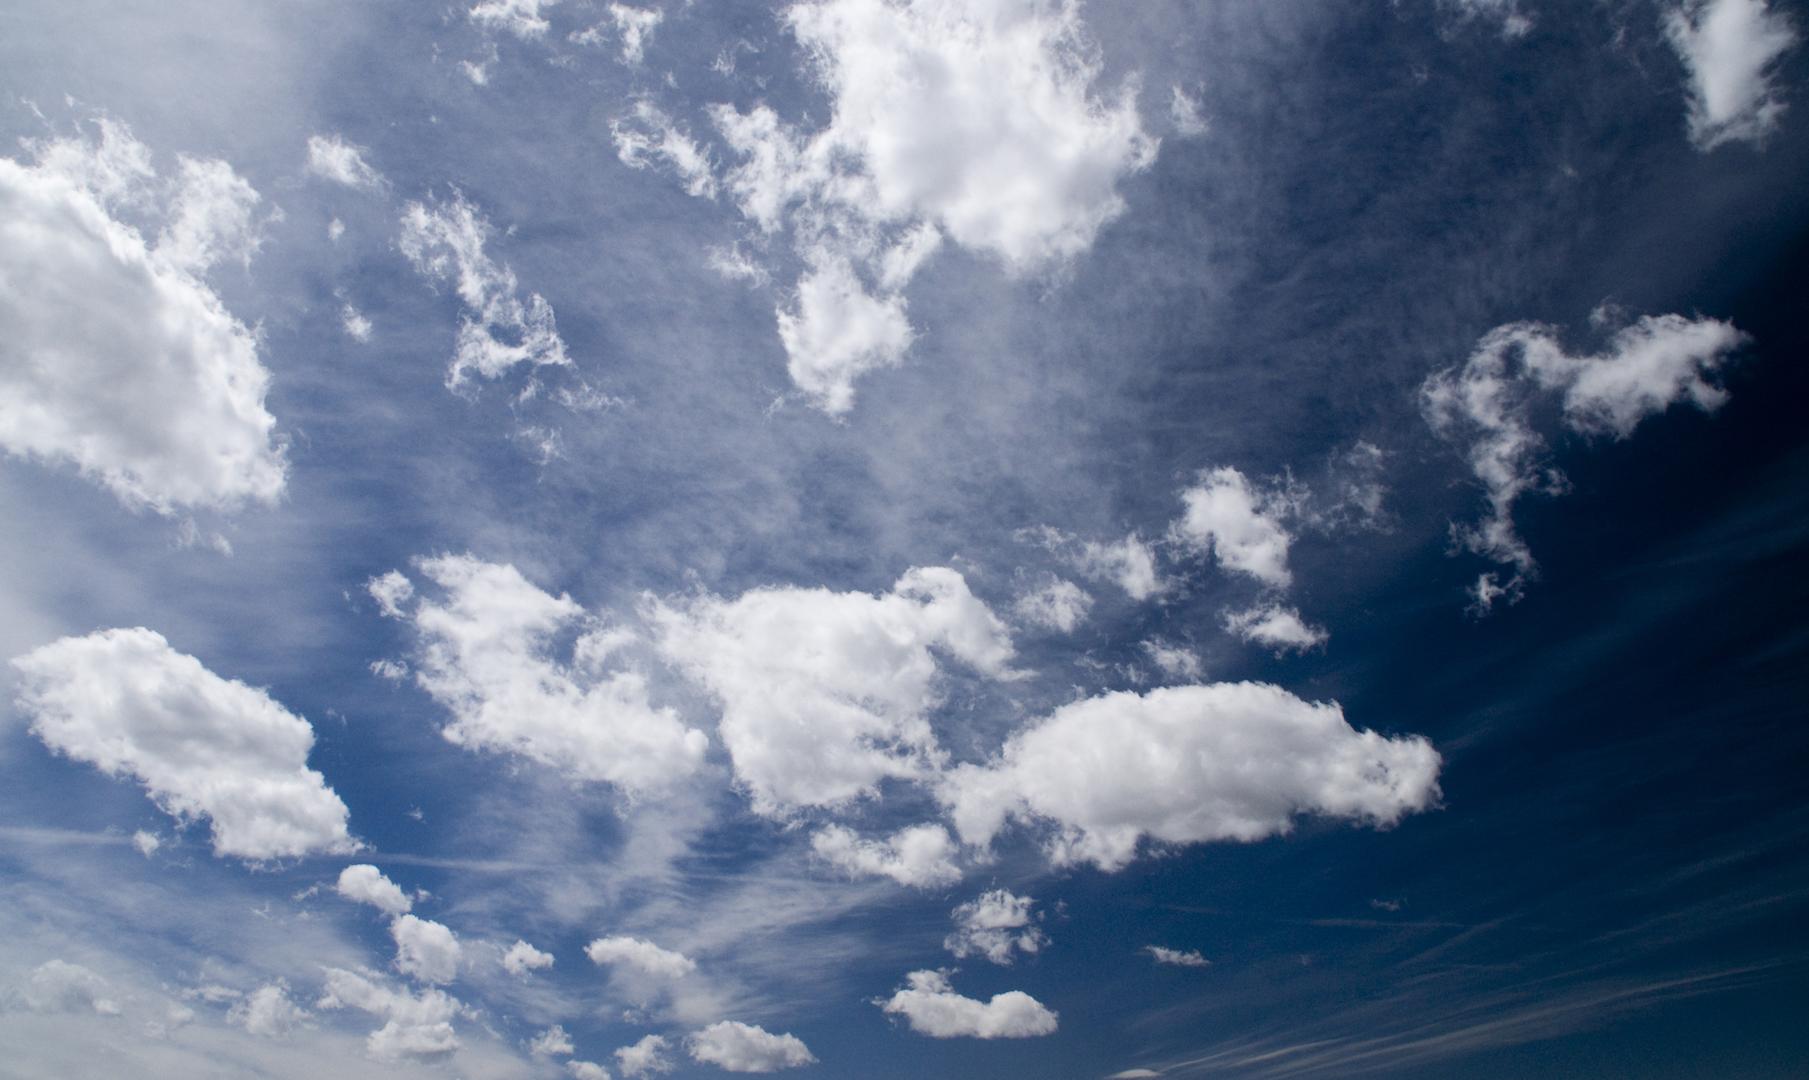 sky-clouds-cloudy-weather.jpg